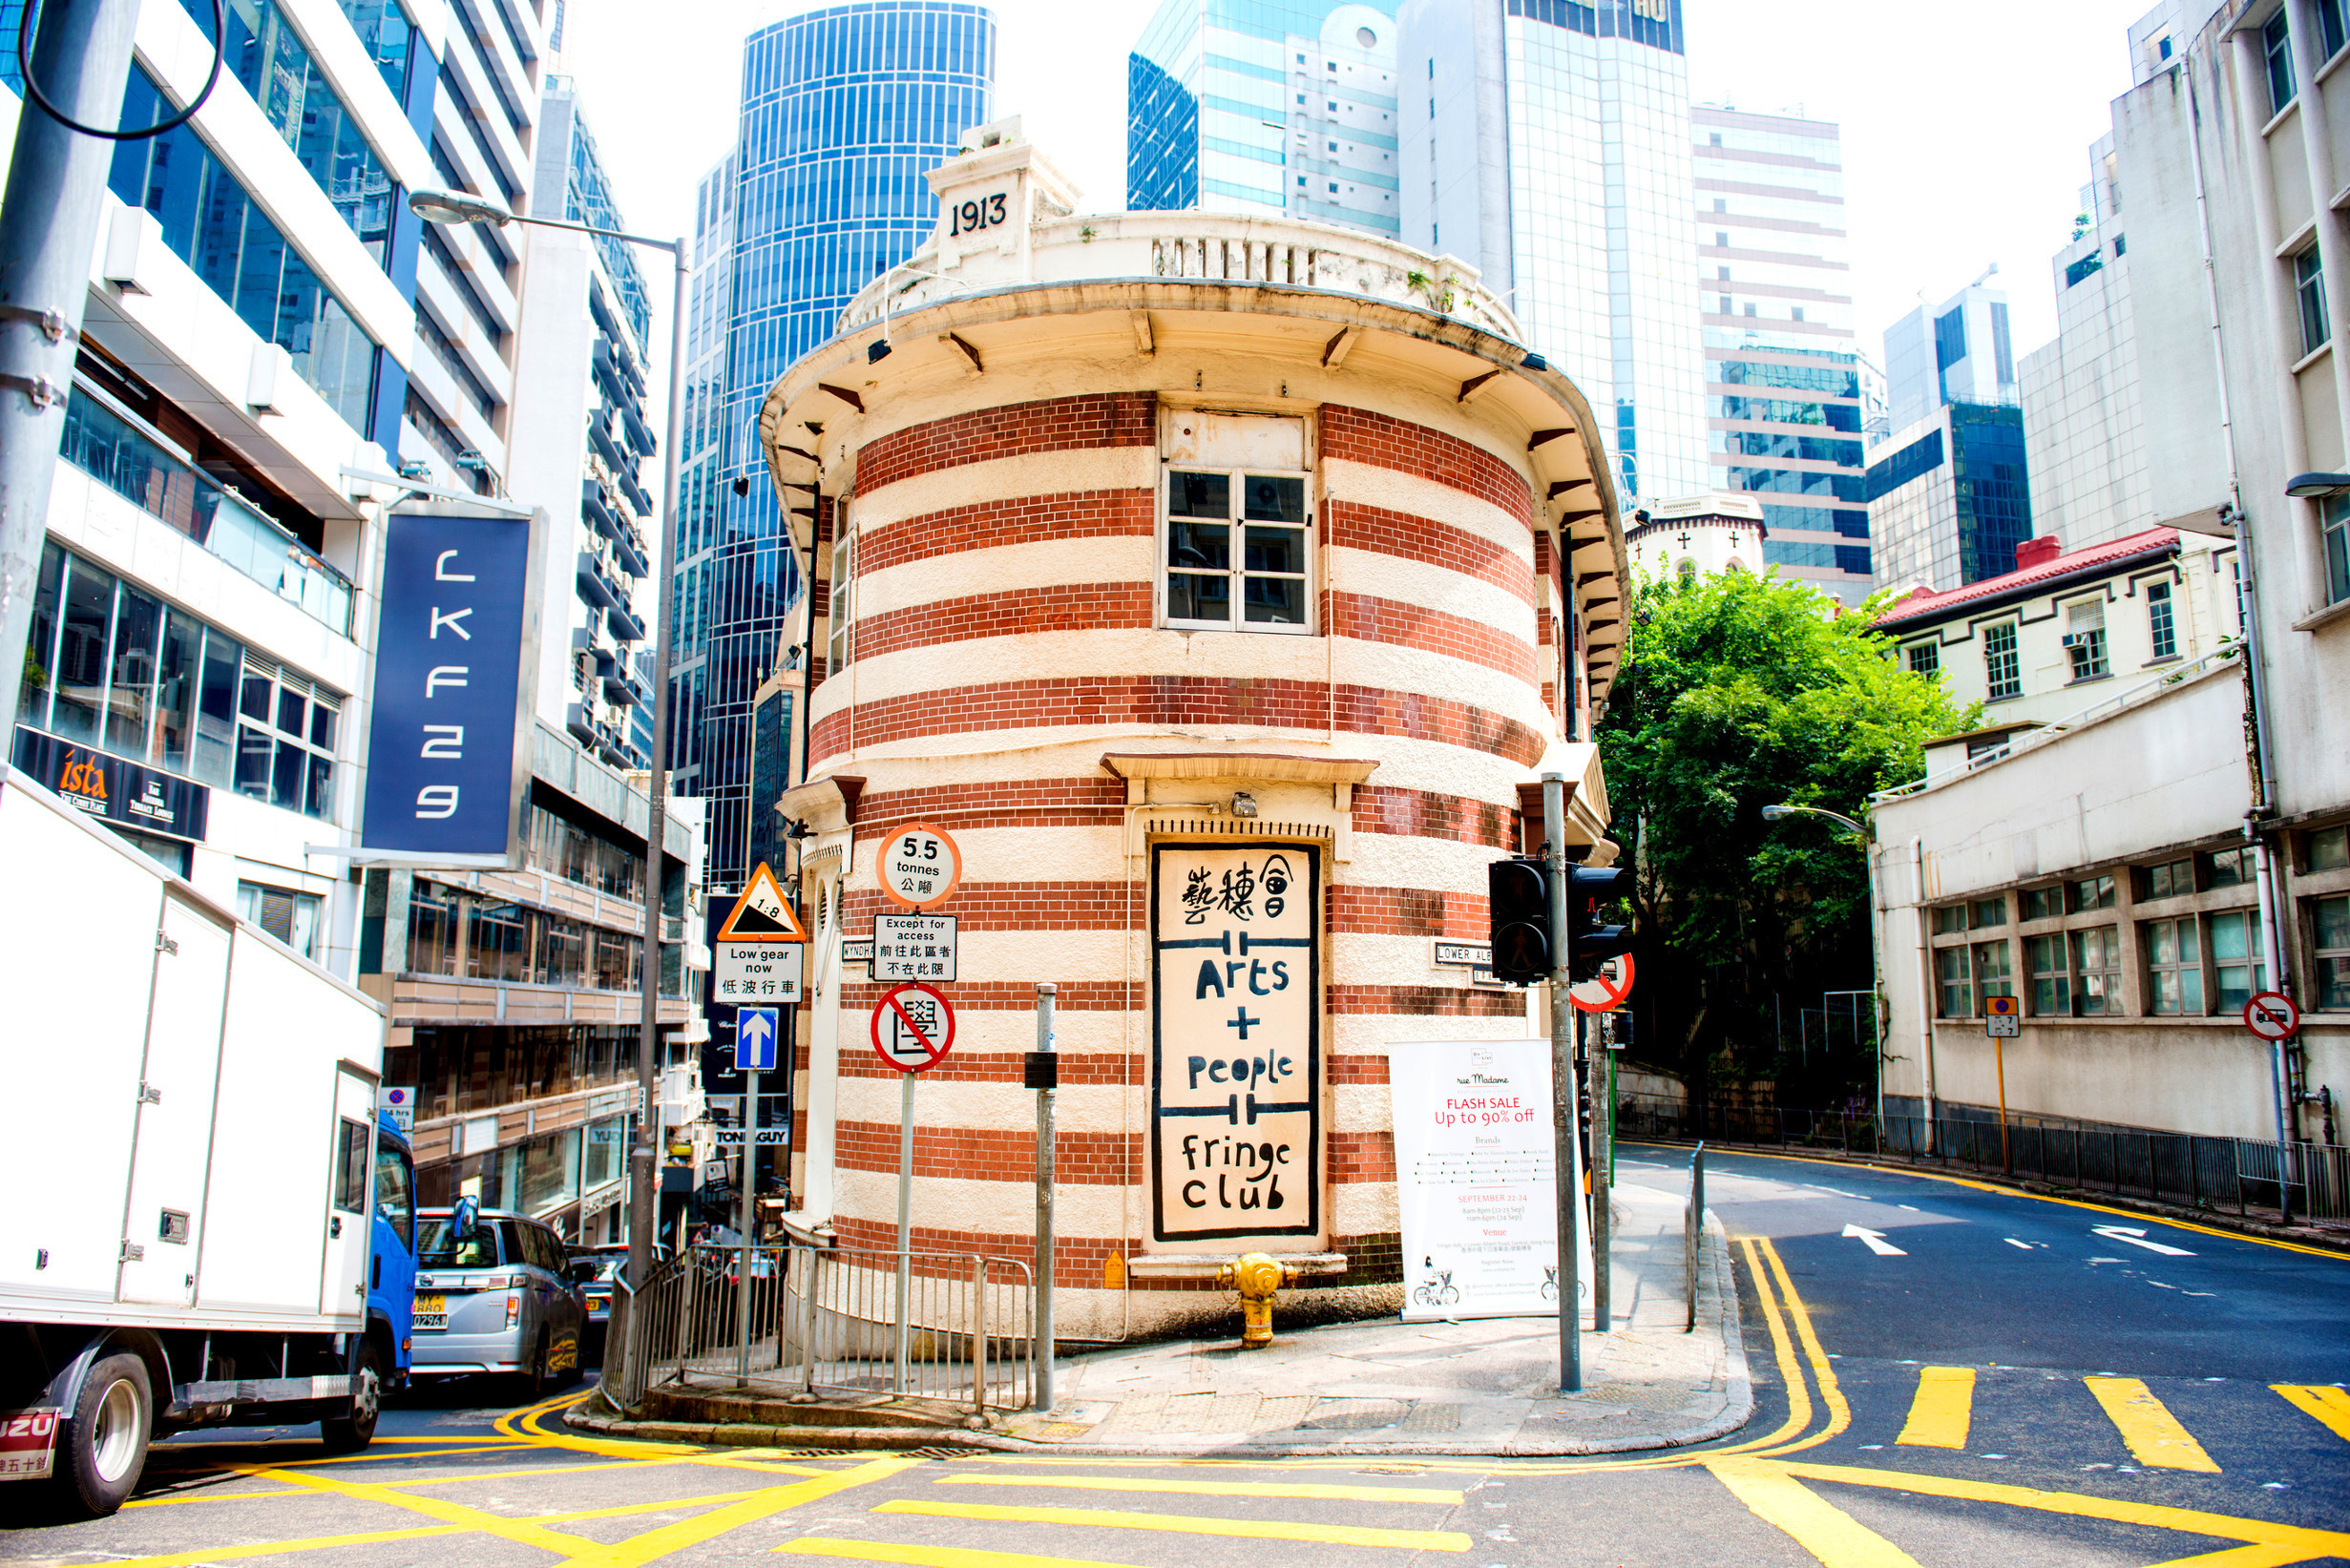 Top 10 Hong Kong Tourist Attractions